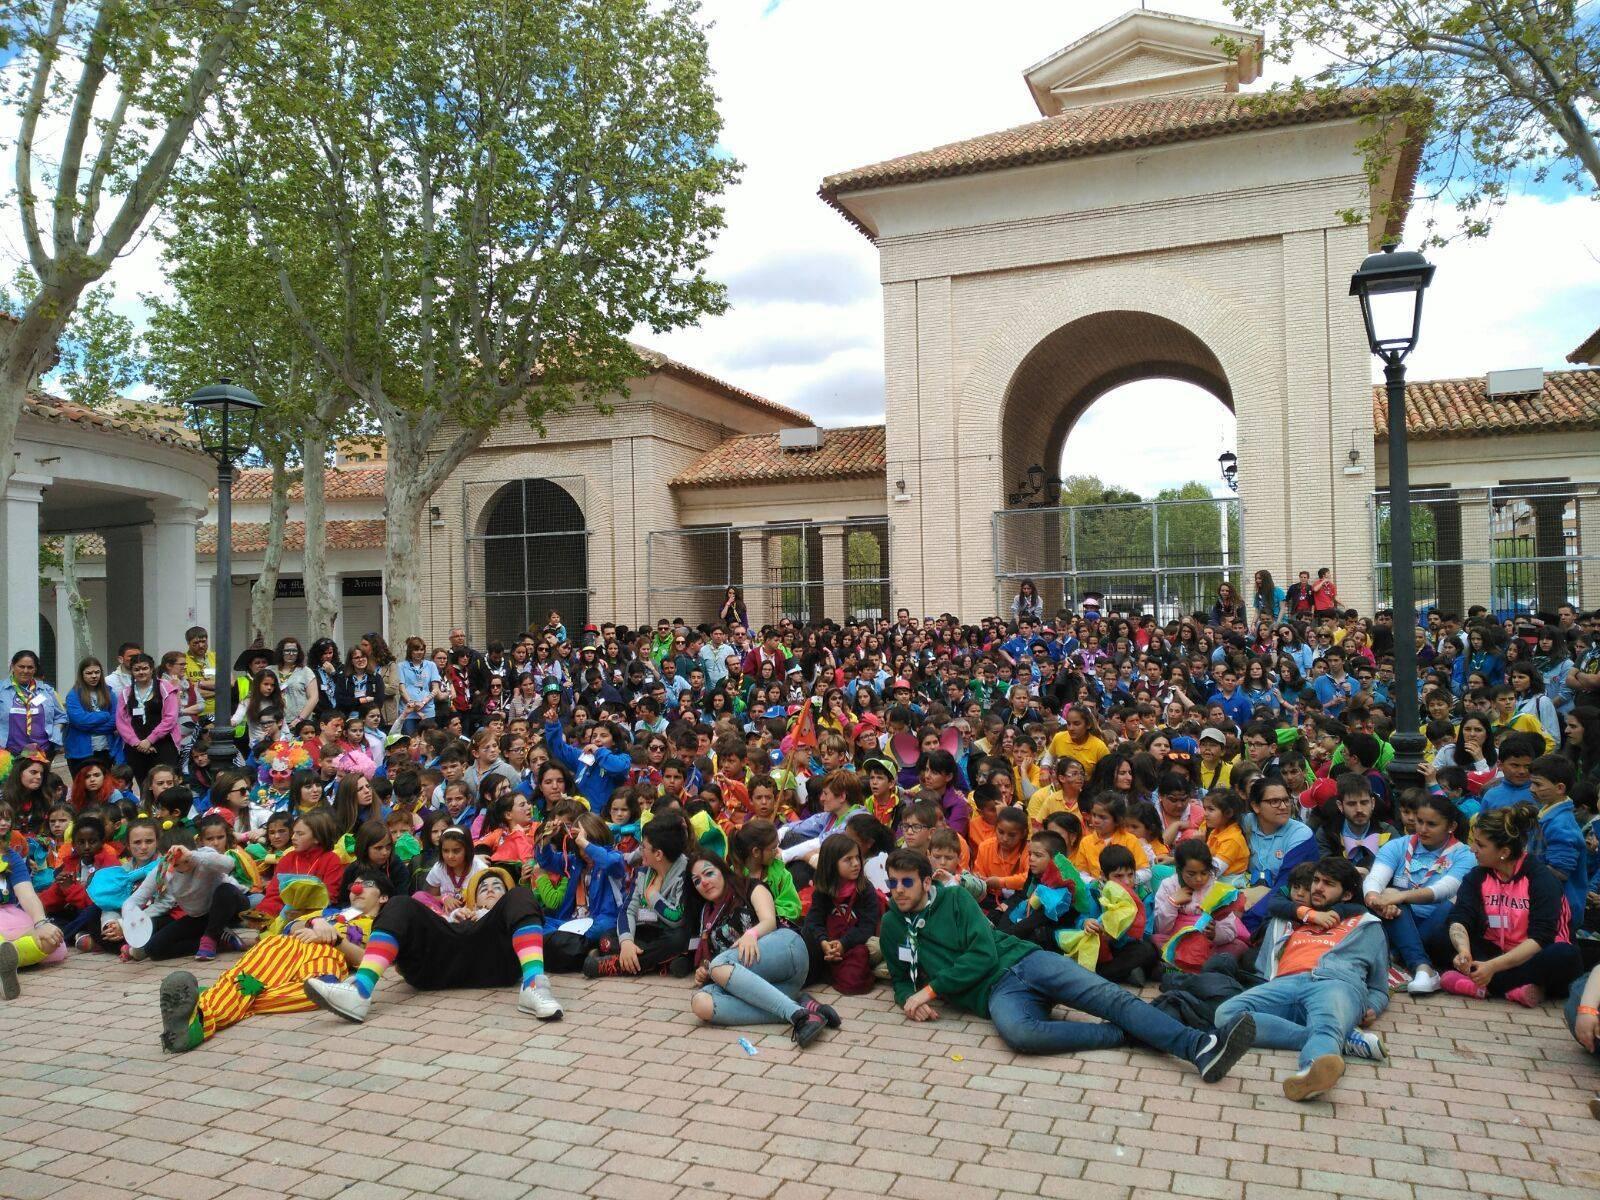 celebracion regional de san jorge de los scout catolicos de clm